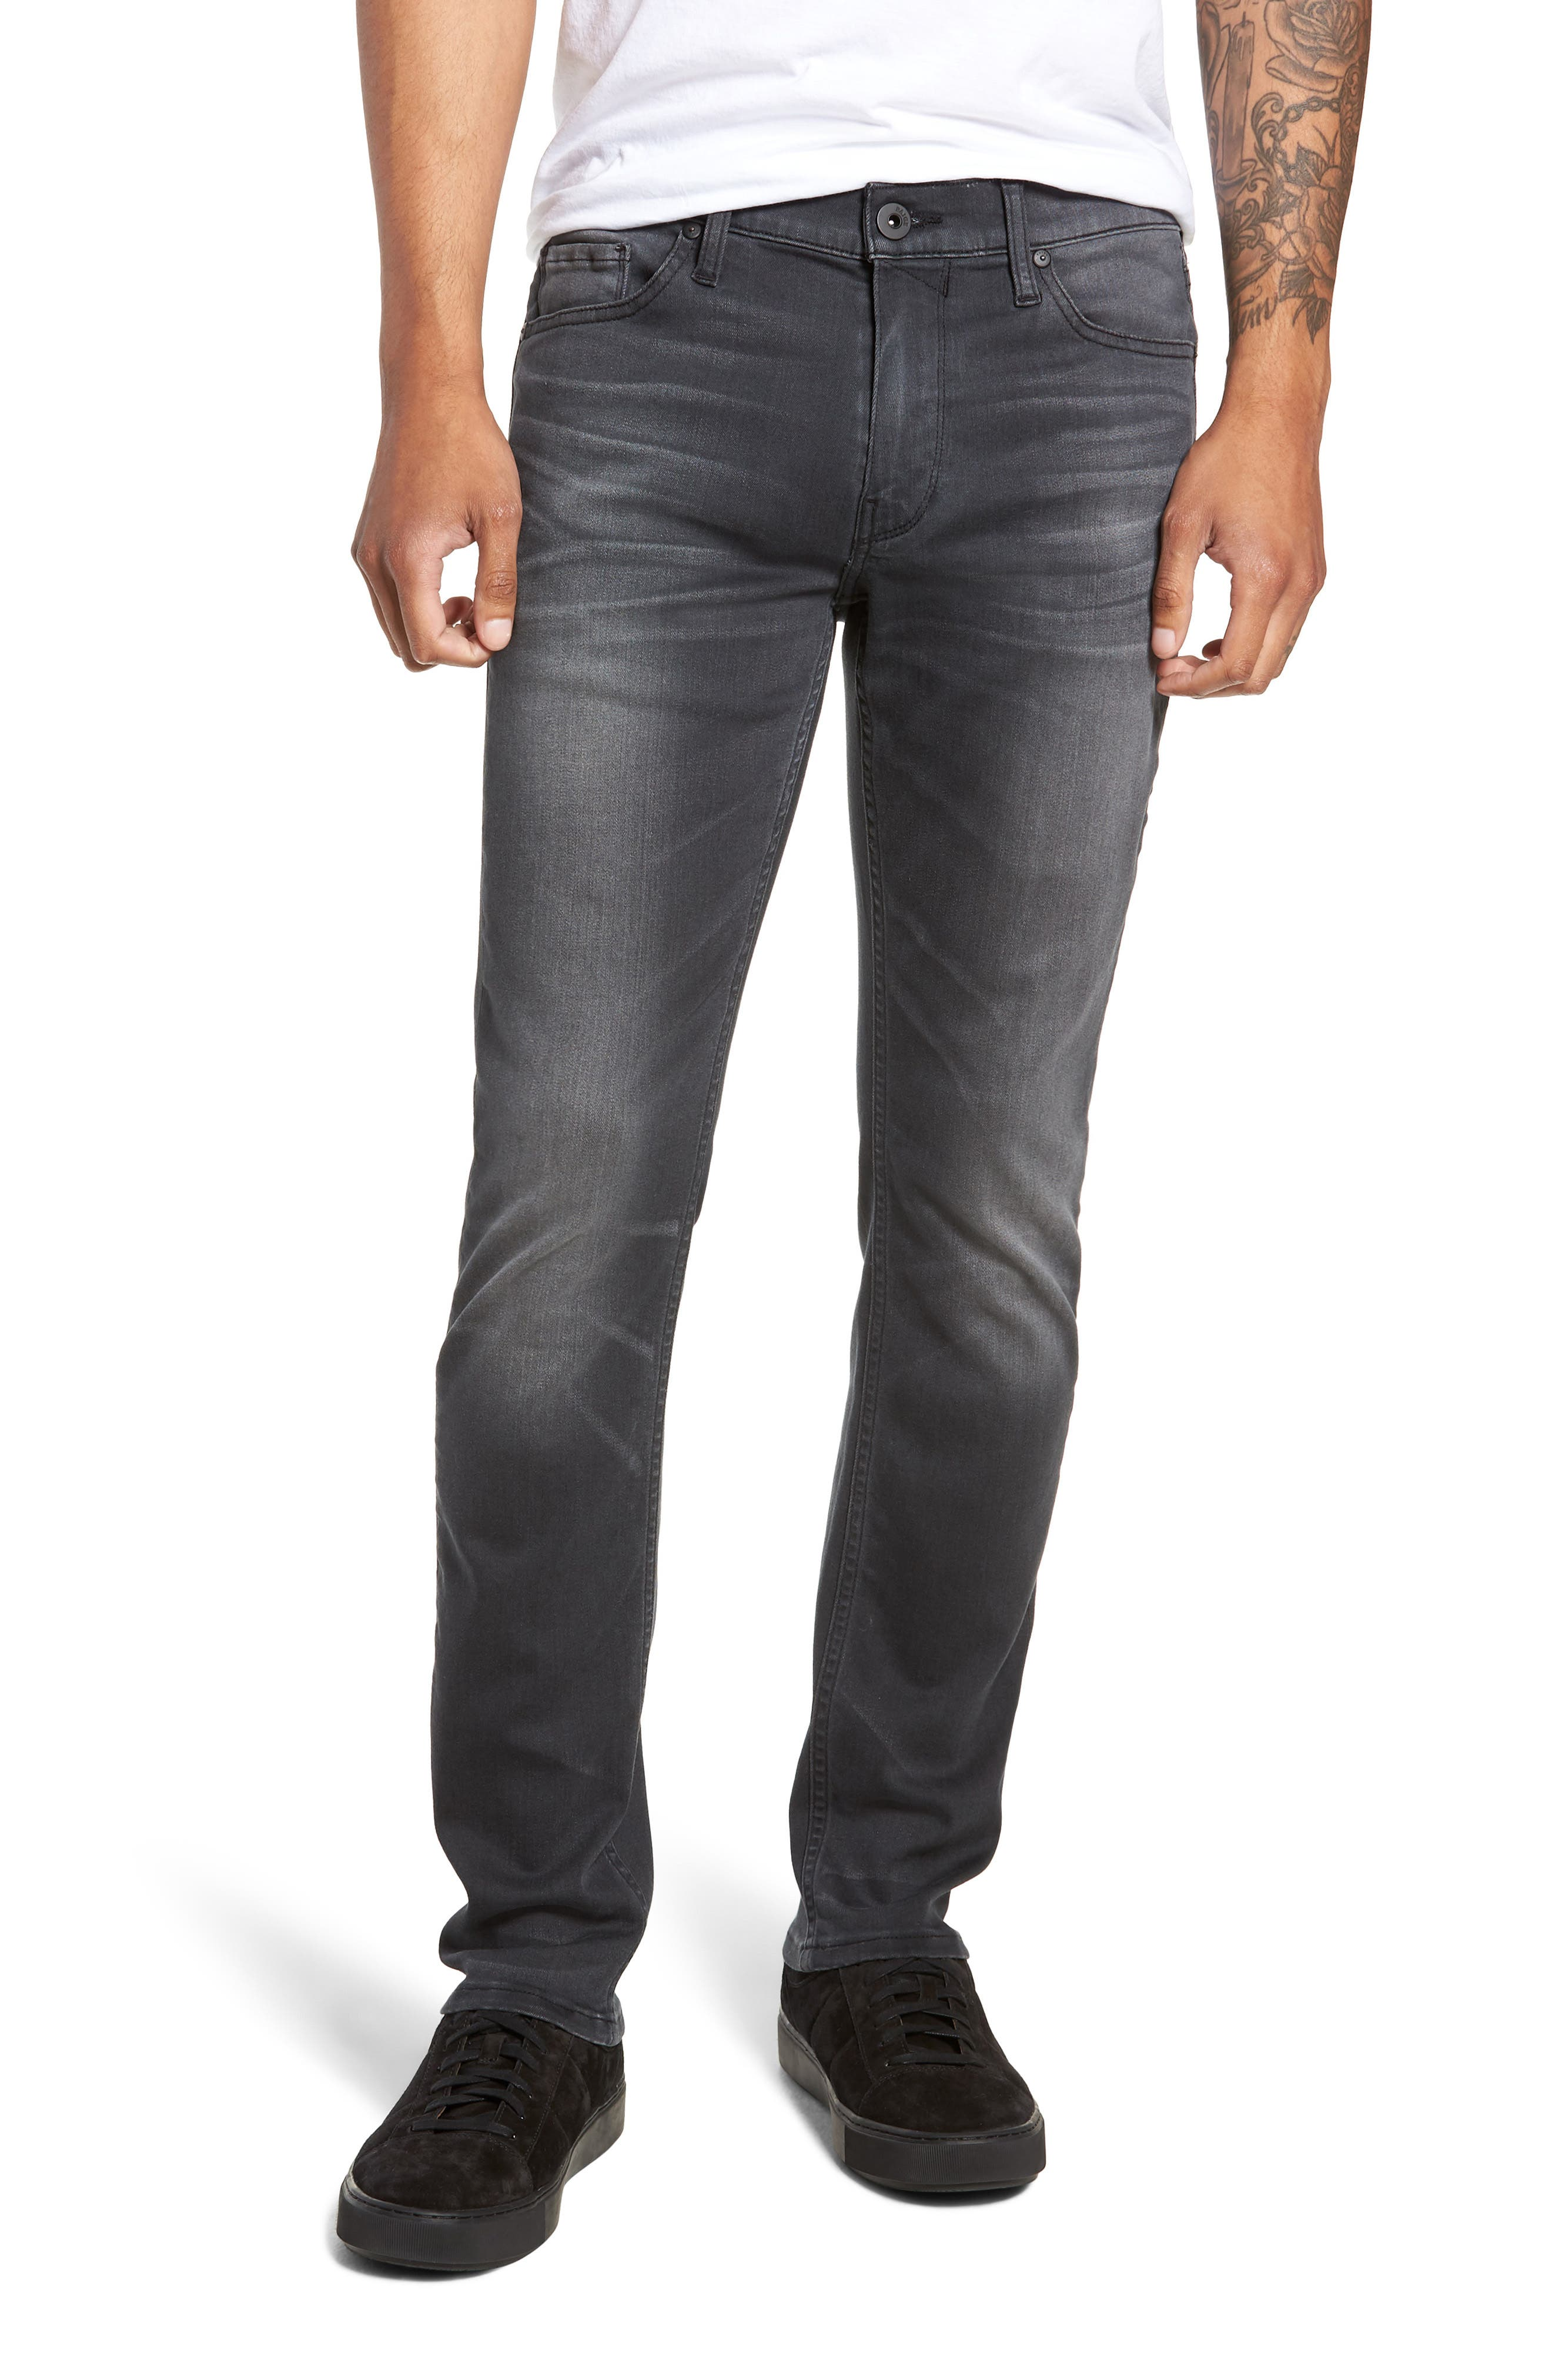 Transcend - Normandie Straight Leg Jeans,                             Main thumbnail 1, color,                             SHELDON